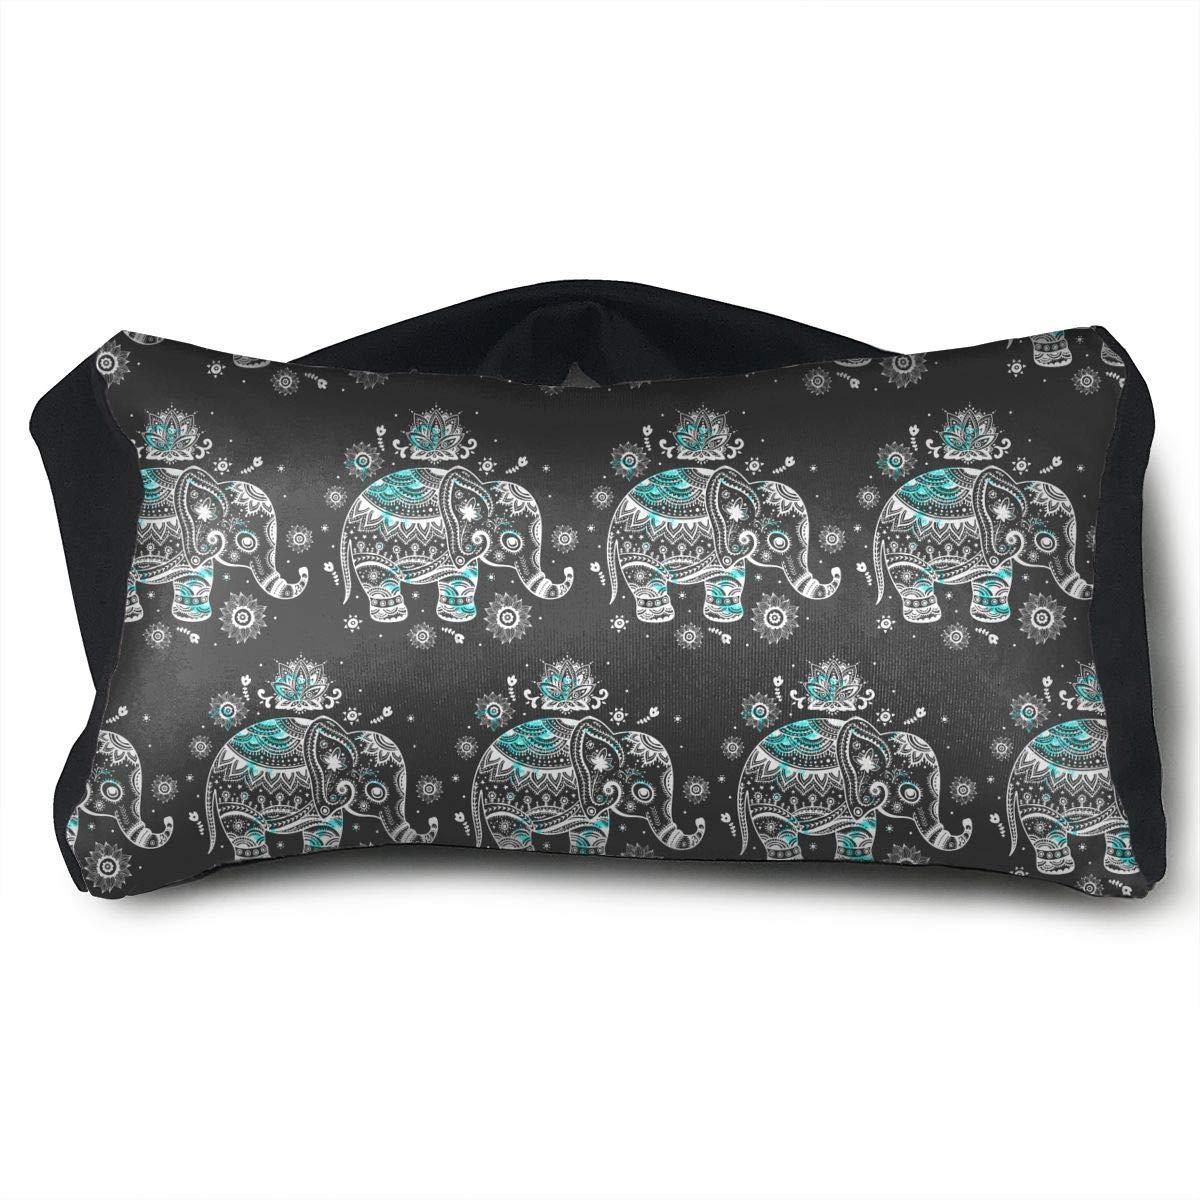 SUNNMOON Fashon Animal India Elephant Collage Neck Travel Pillow and Eye Mask Compact Versatile and Pillow for Airplanes, Travel Pillow and Eye Mask Washable Pillows